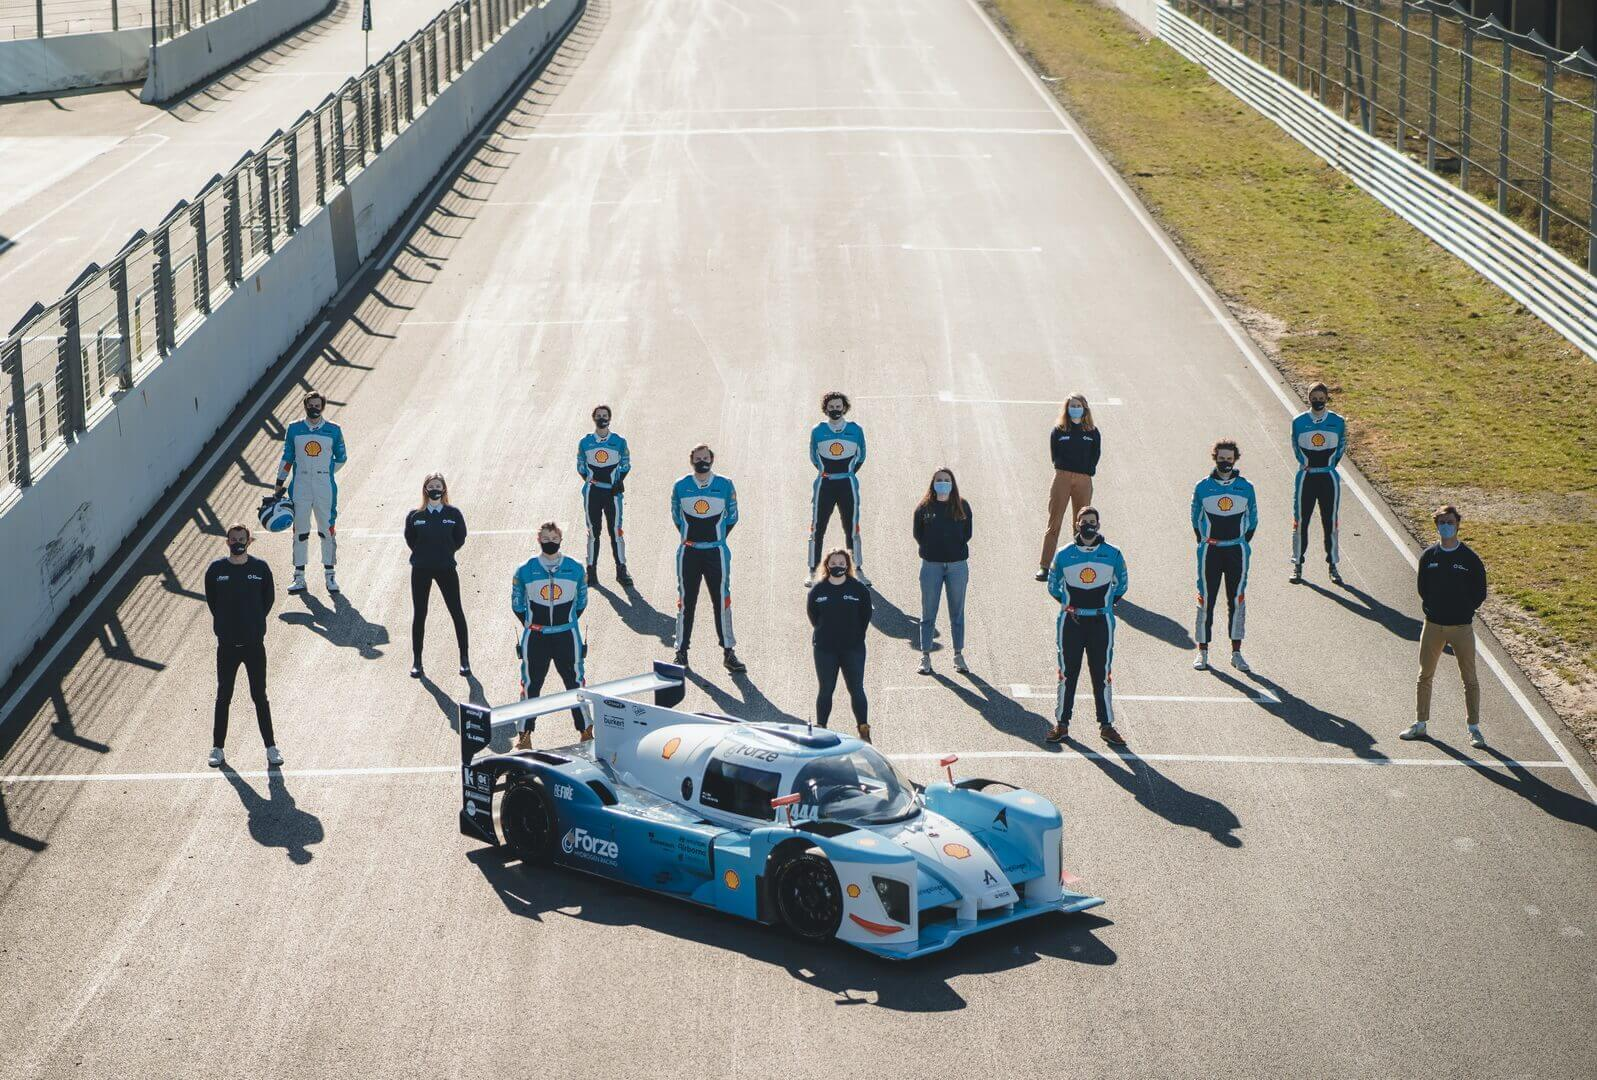 Студенты из Нидерландов разрабатывают суперкар на водороде